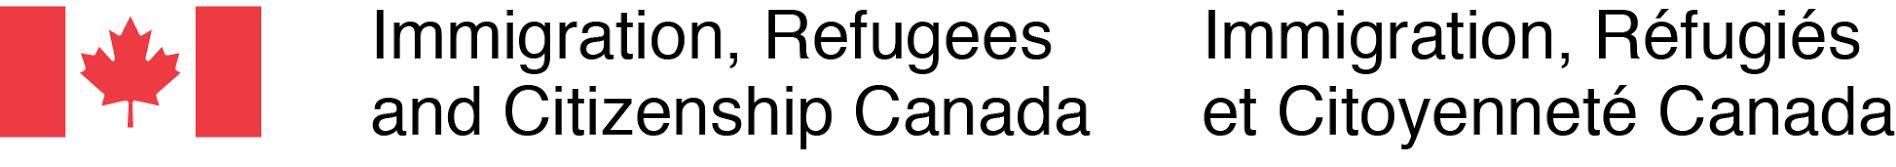 Immigration, Refugees and Citizenship Canada_logo